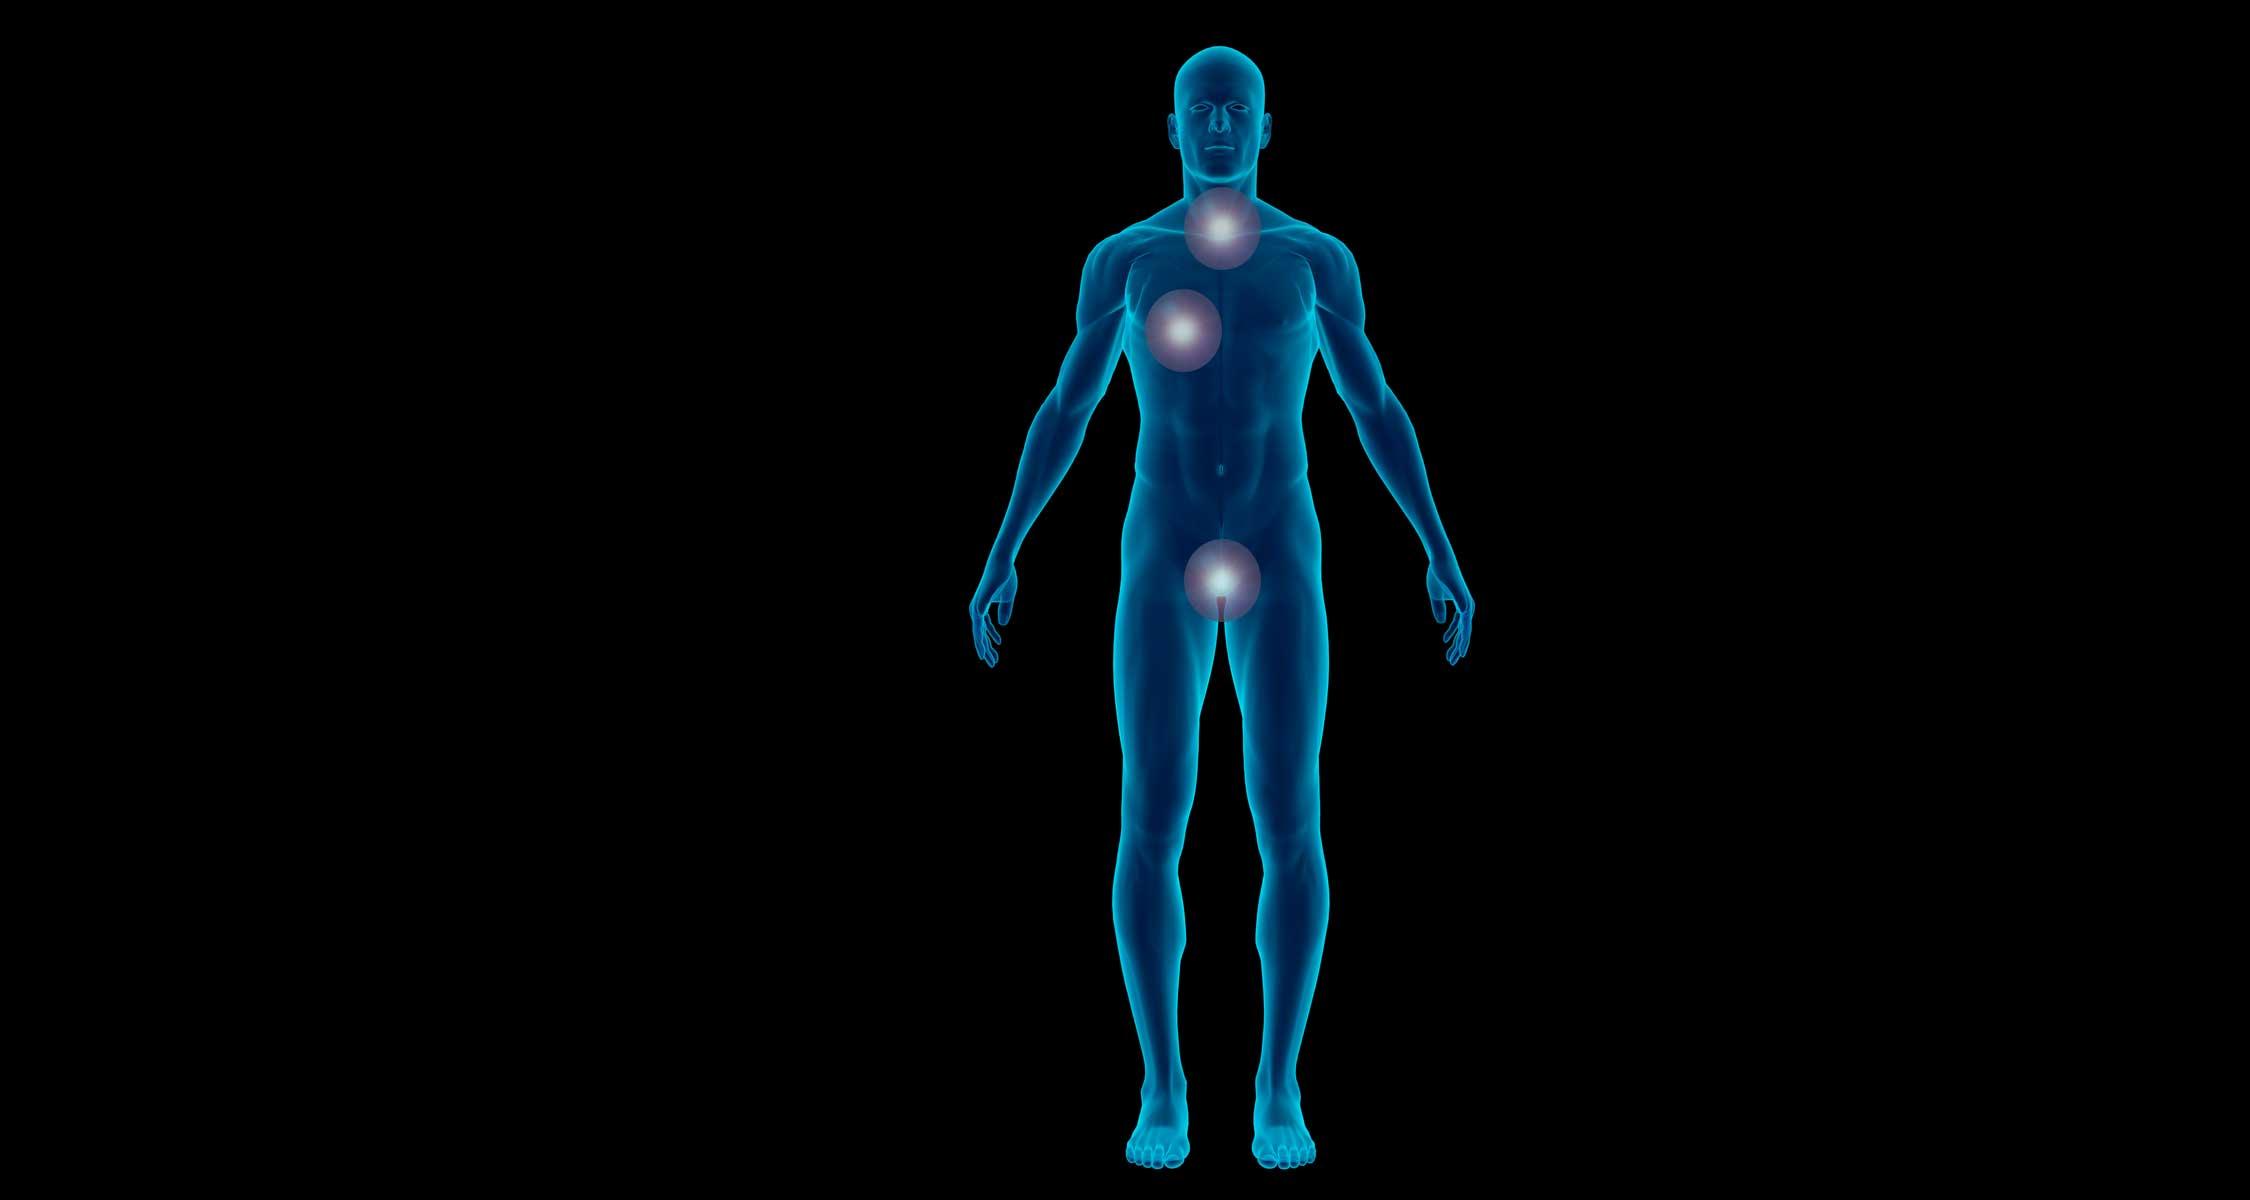 Graphics of human body